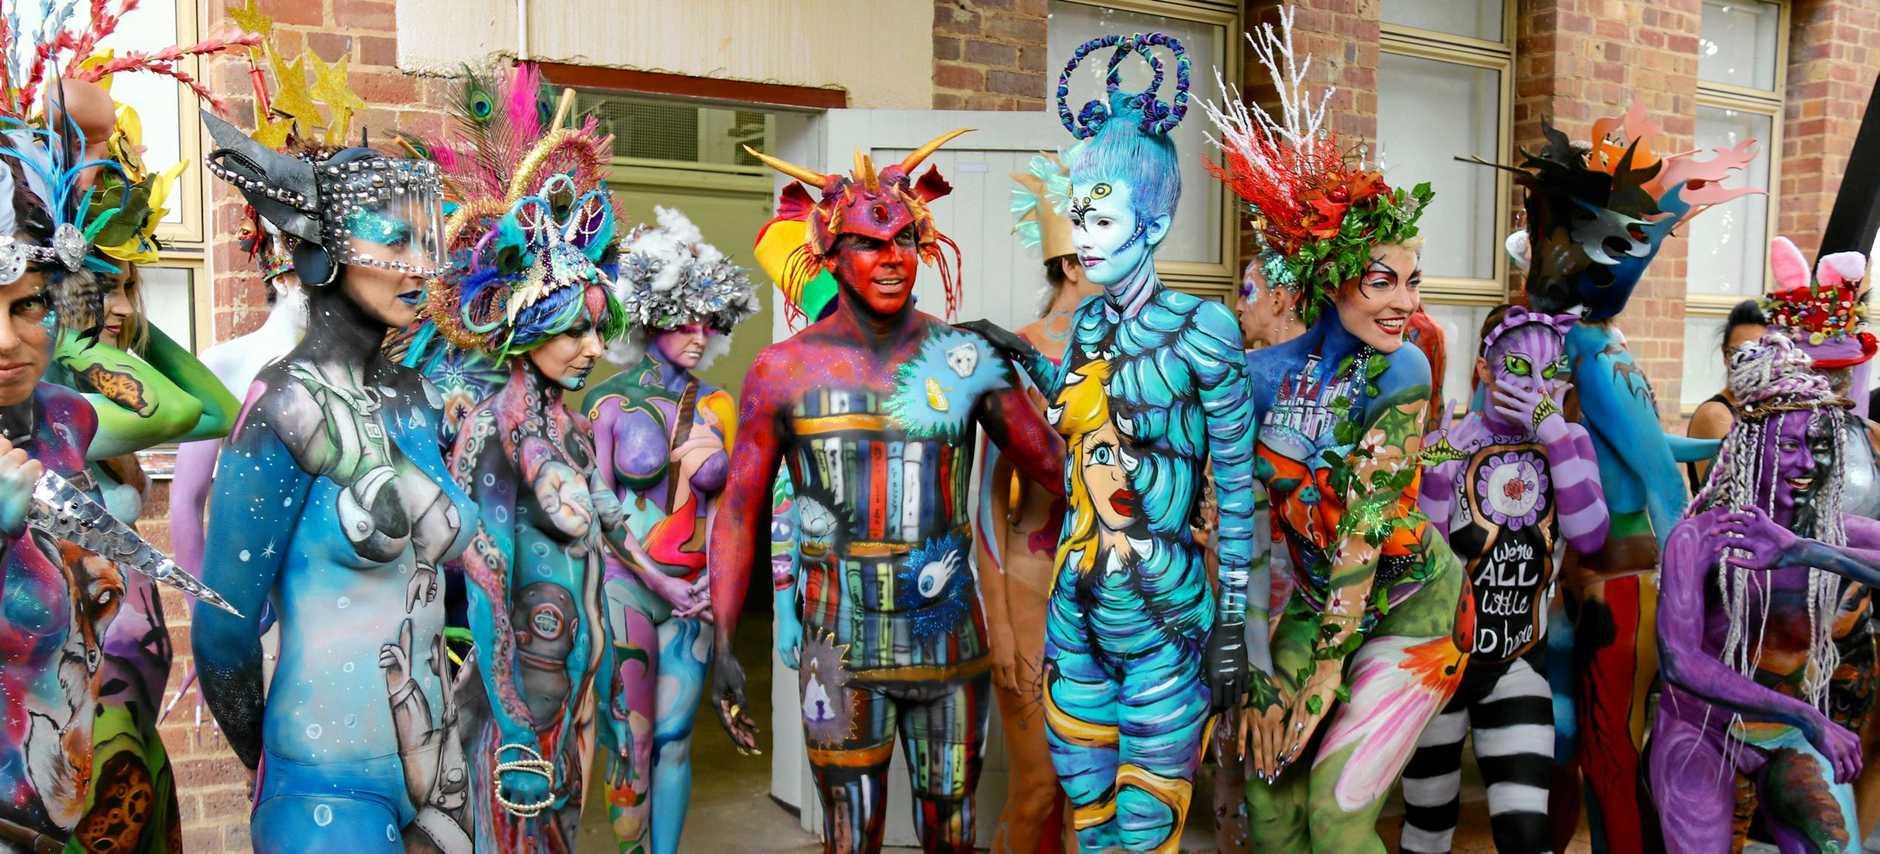 Cooroy S Wild Body Art Noosa News